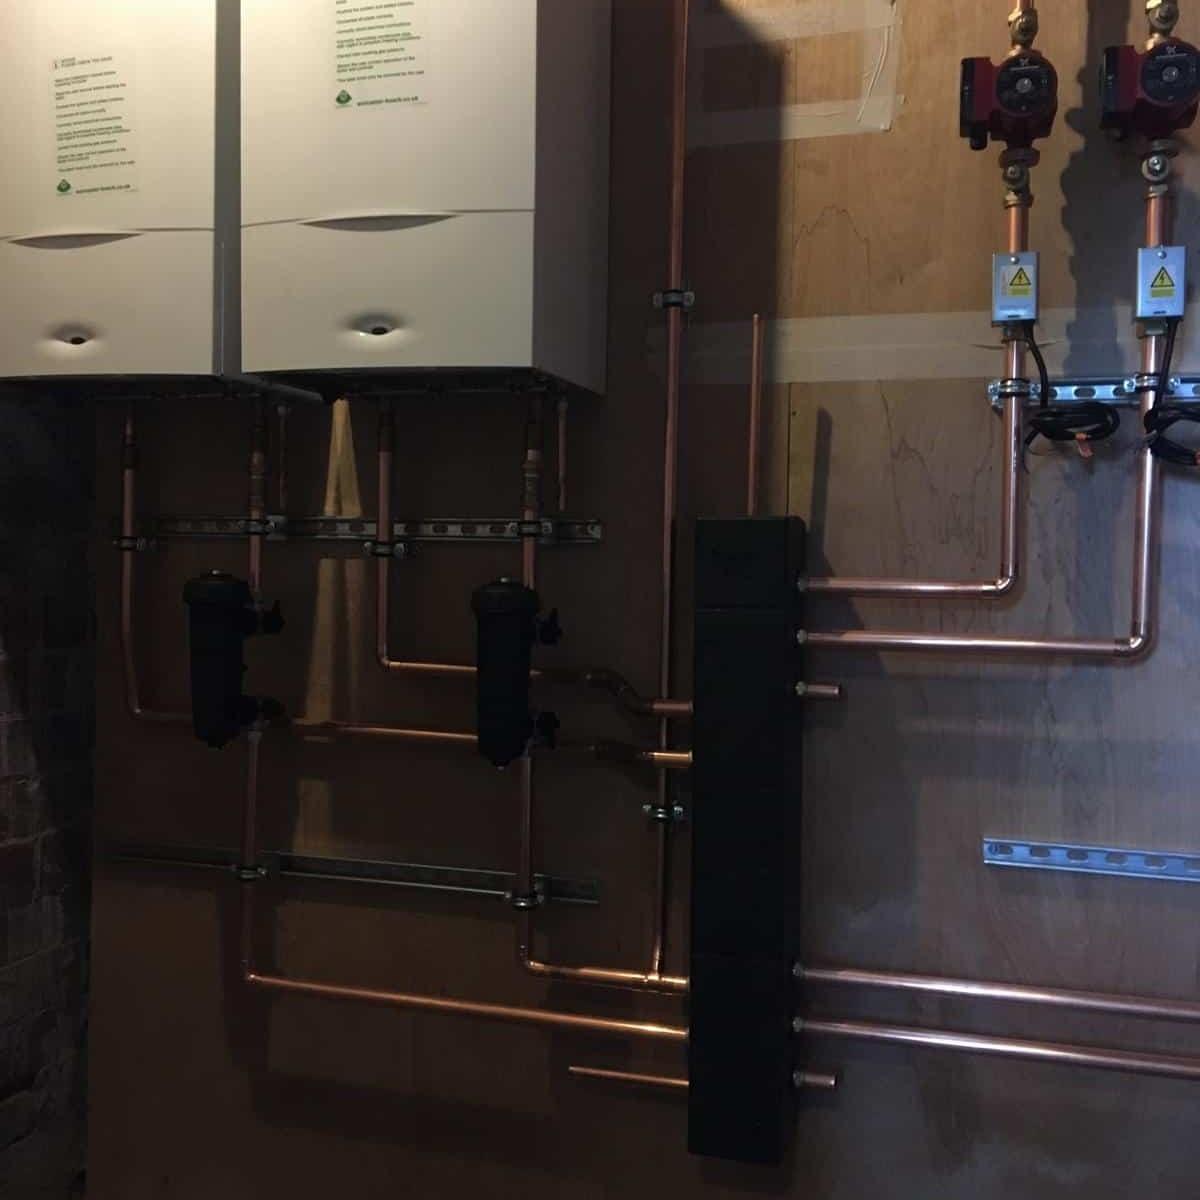 Photos from Bishopton Parish Church heating system 6